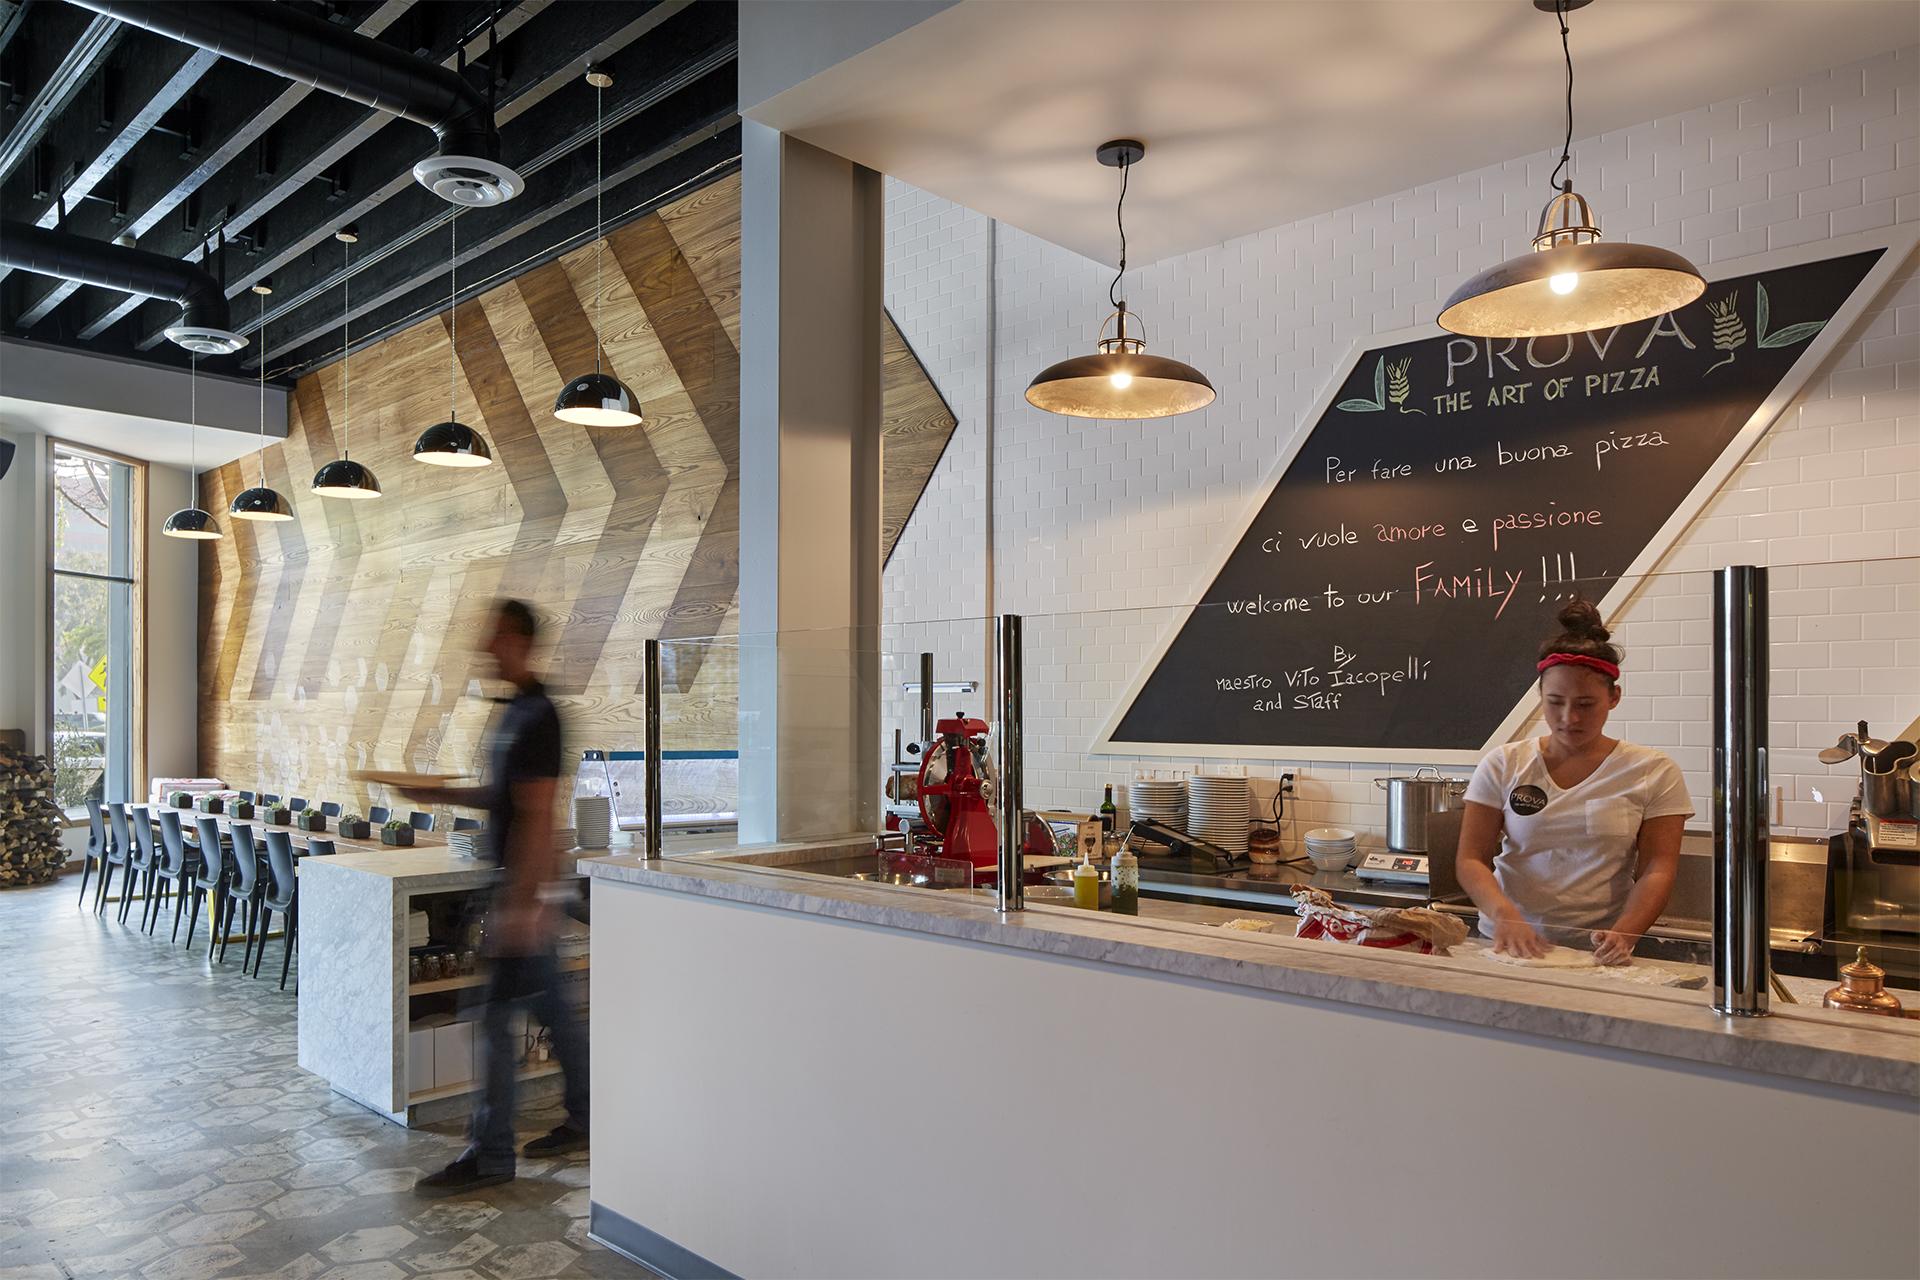 belzberg-architects-Prova-Pizzeria-104.jpg